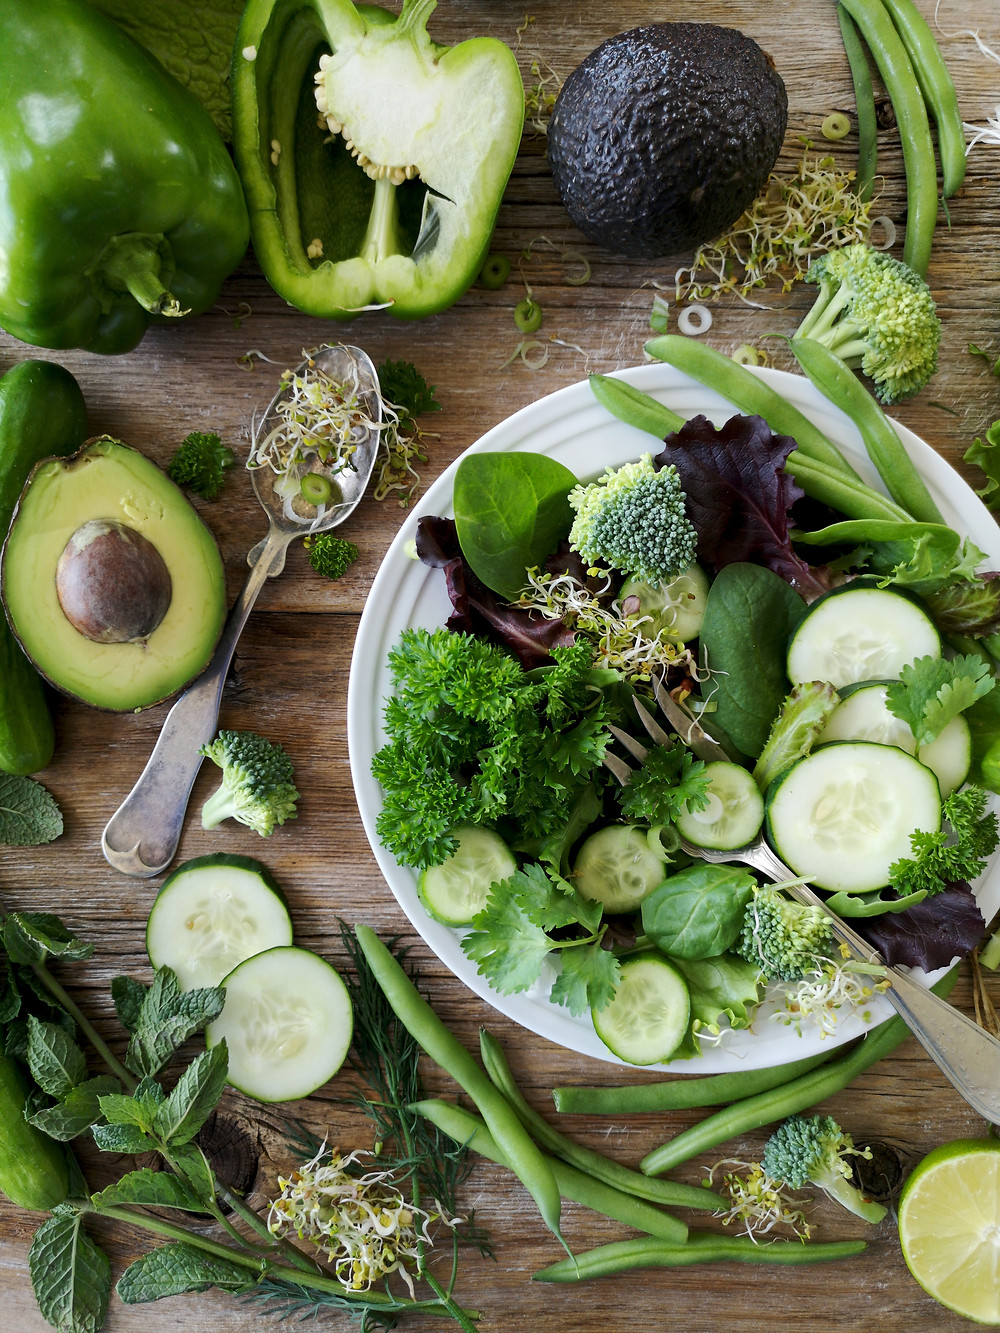 foods high in fiber help keep bowel movements healthy